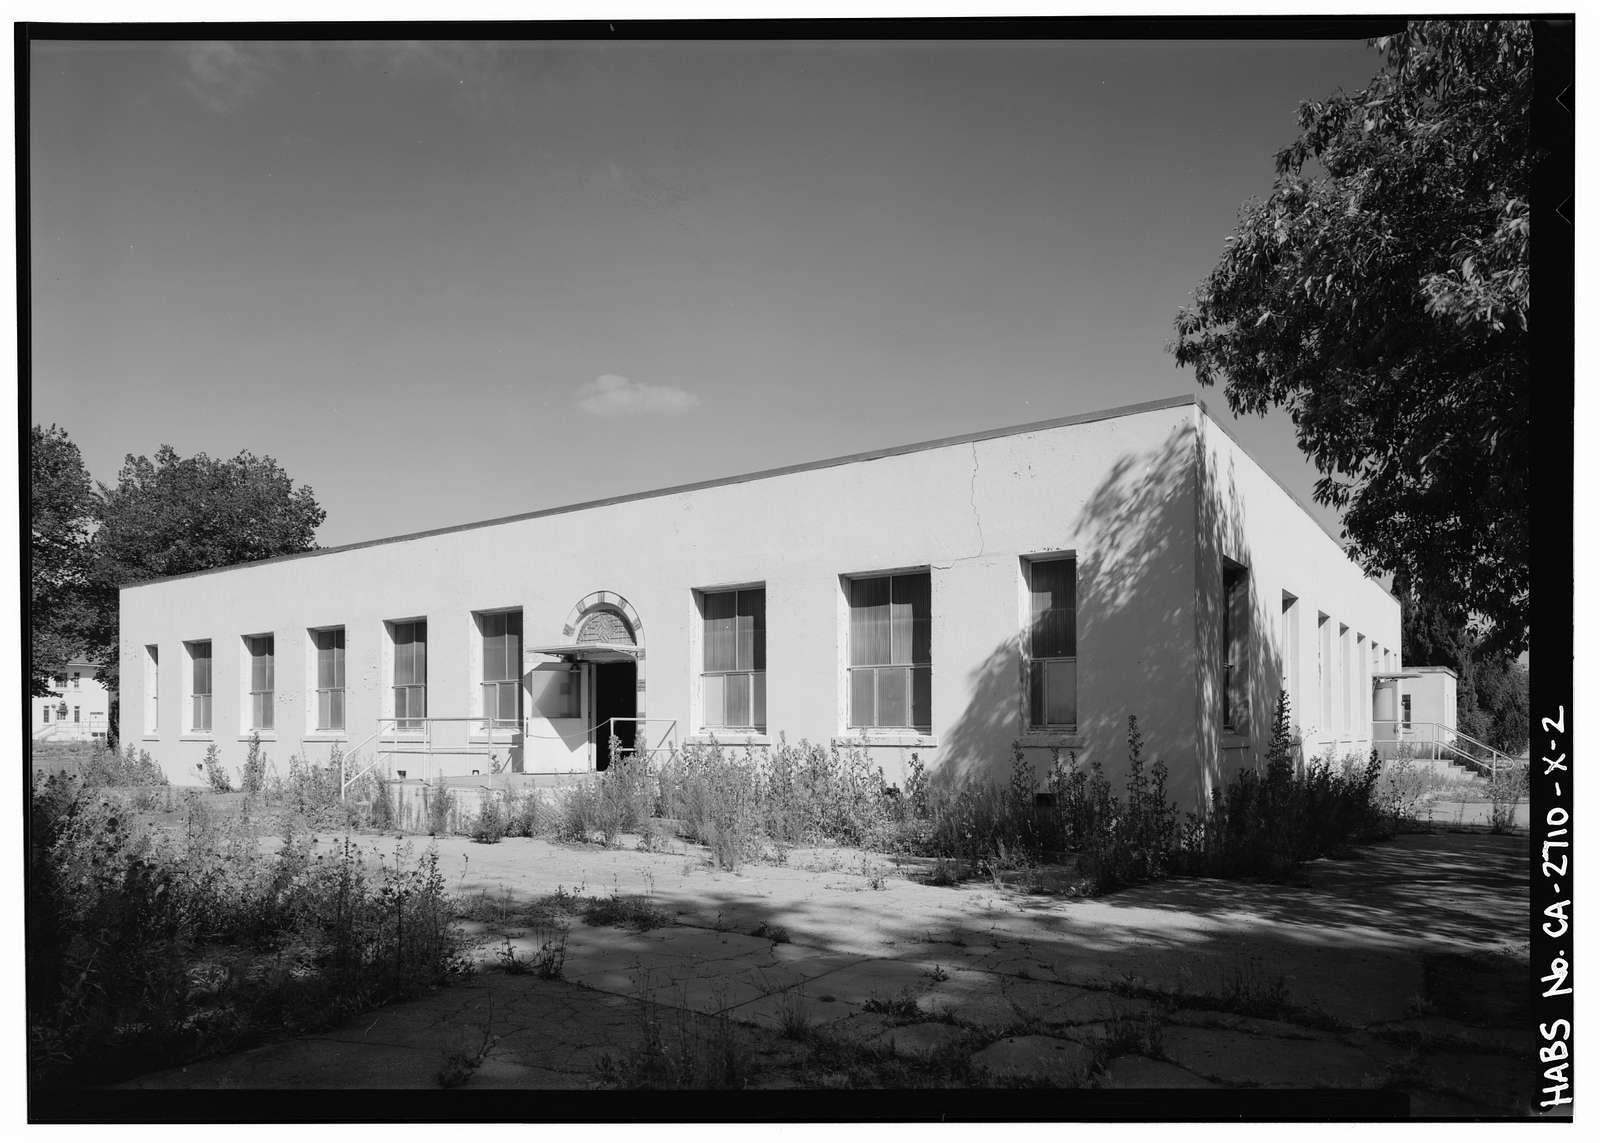 Agnews State Hospital, Occupational Therapy Building, Second Street near Avenue A, Santa Clara, Santa Clara County, CA